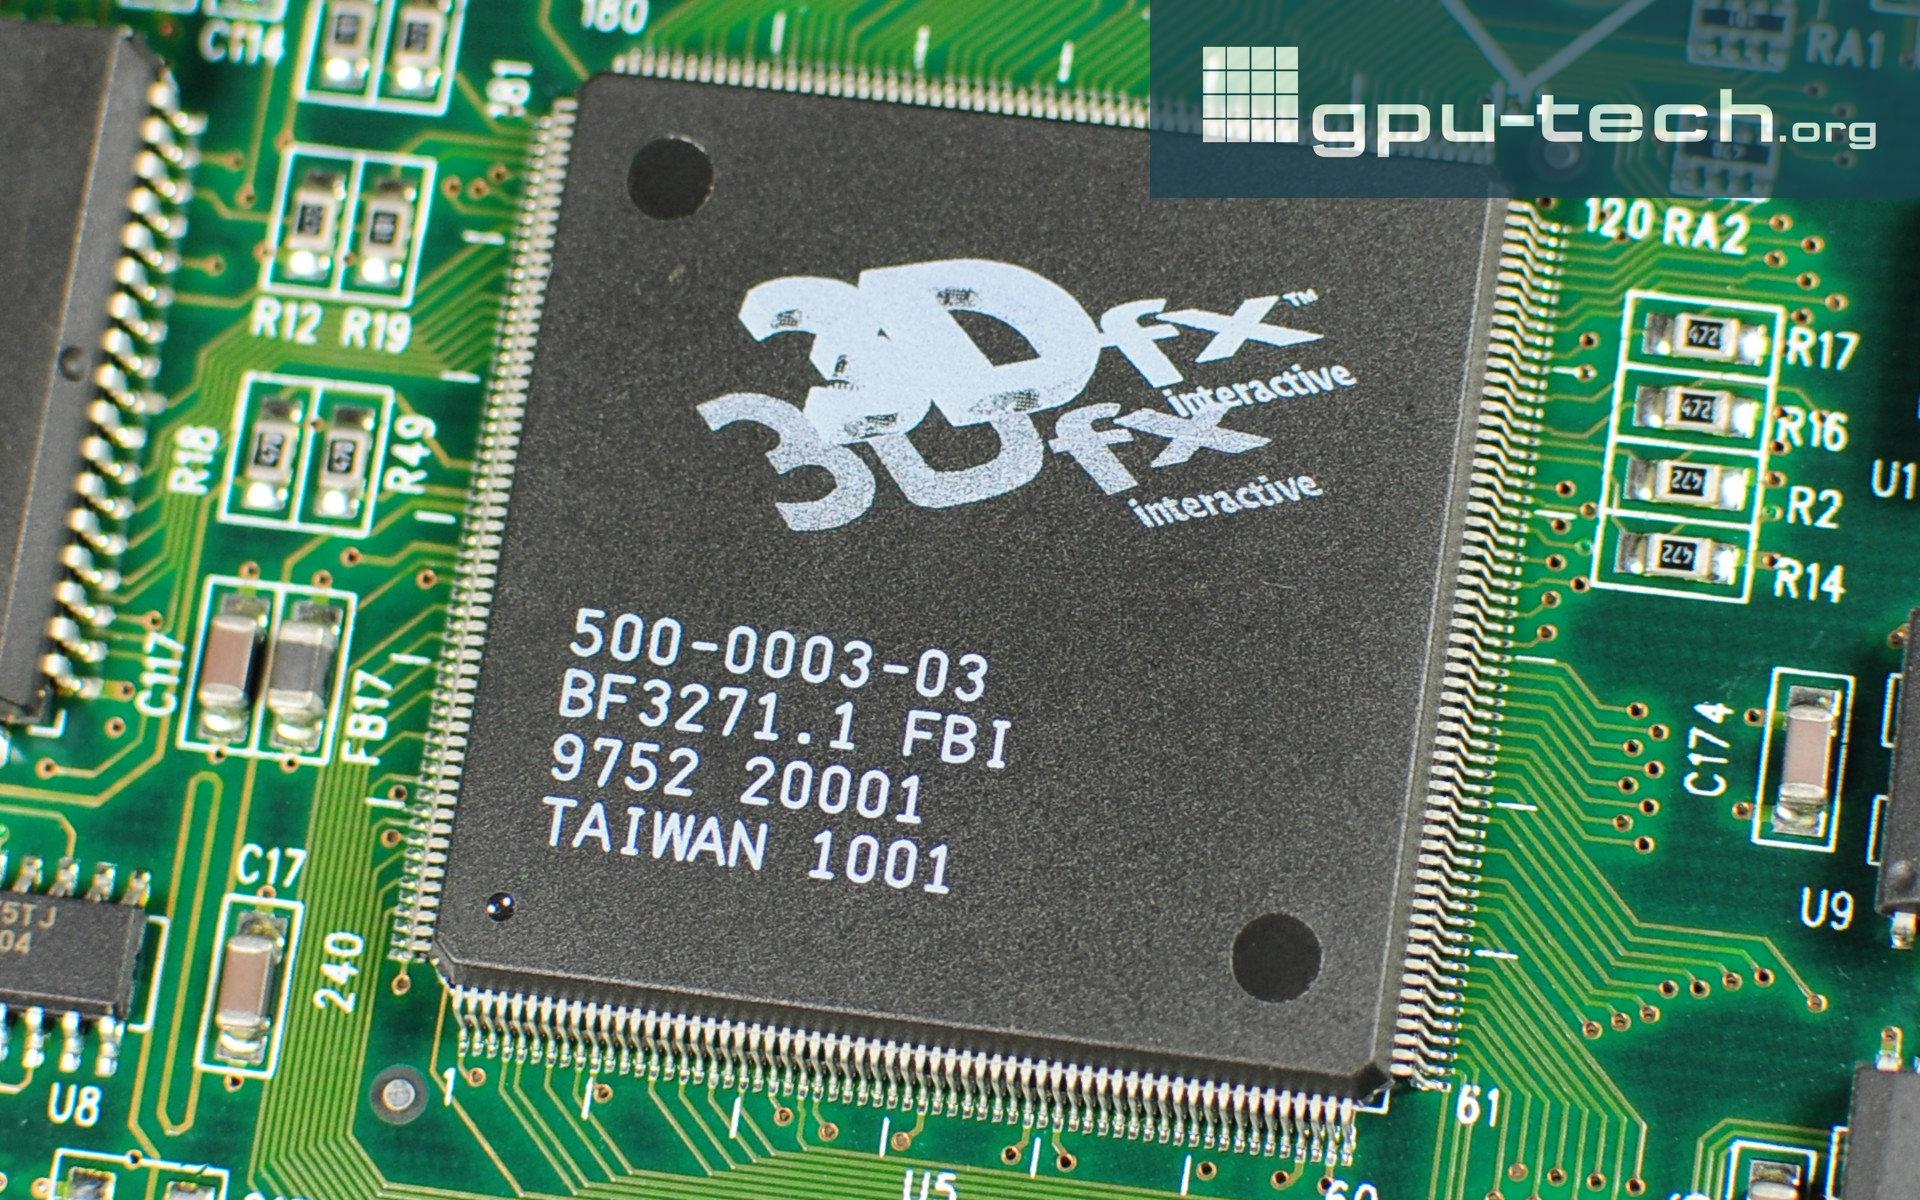 3dfx SST-1 Framebuffer Interface